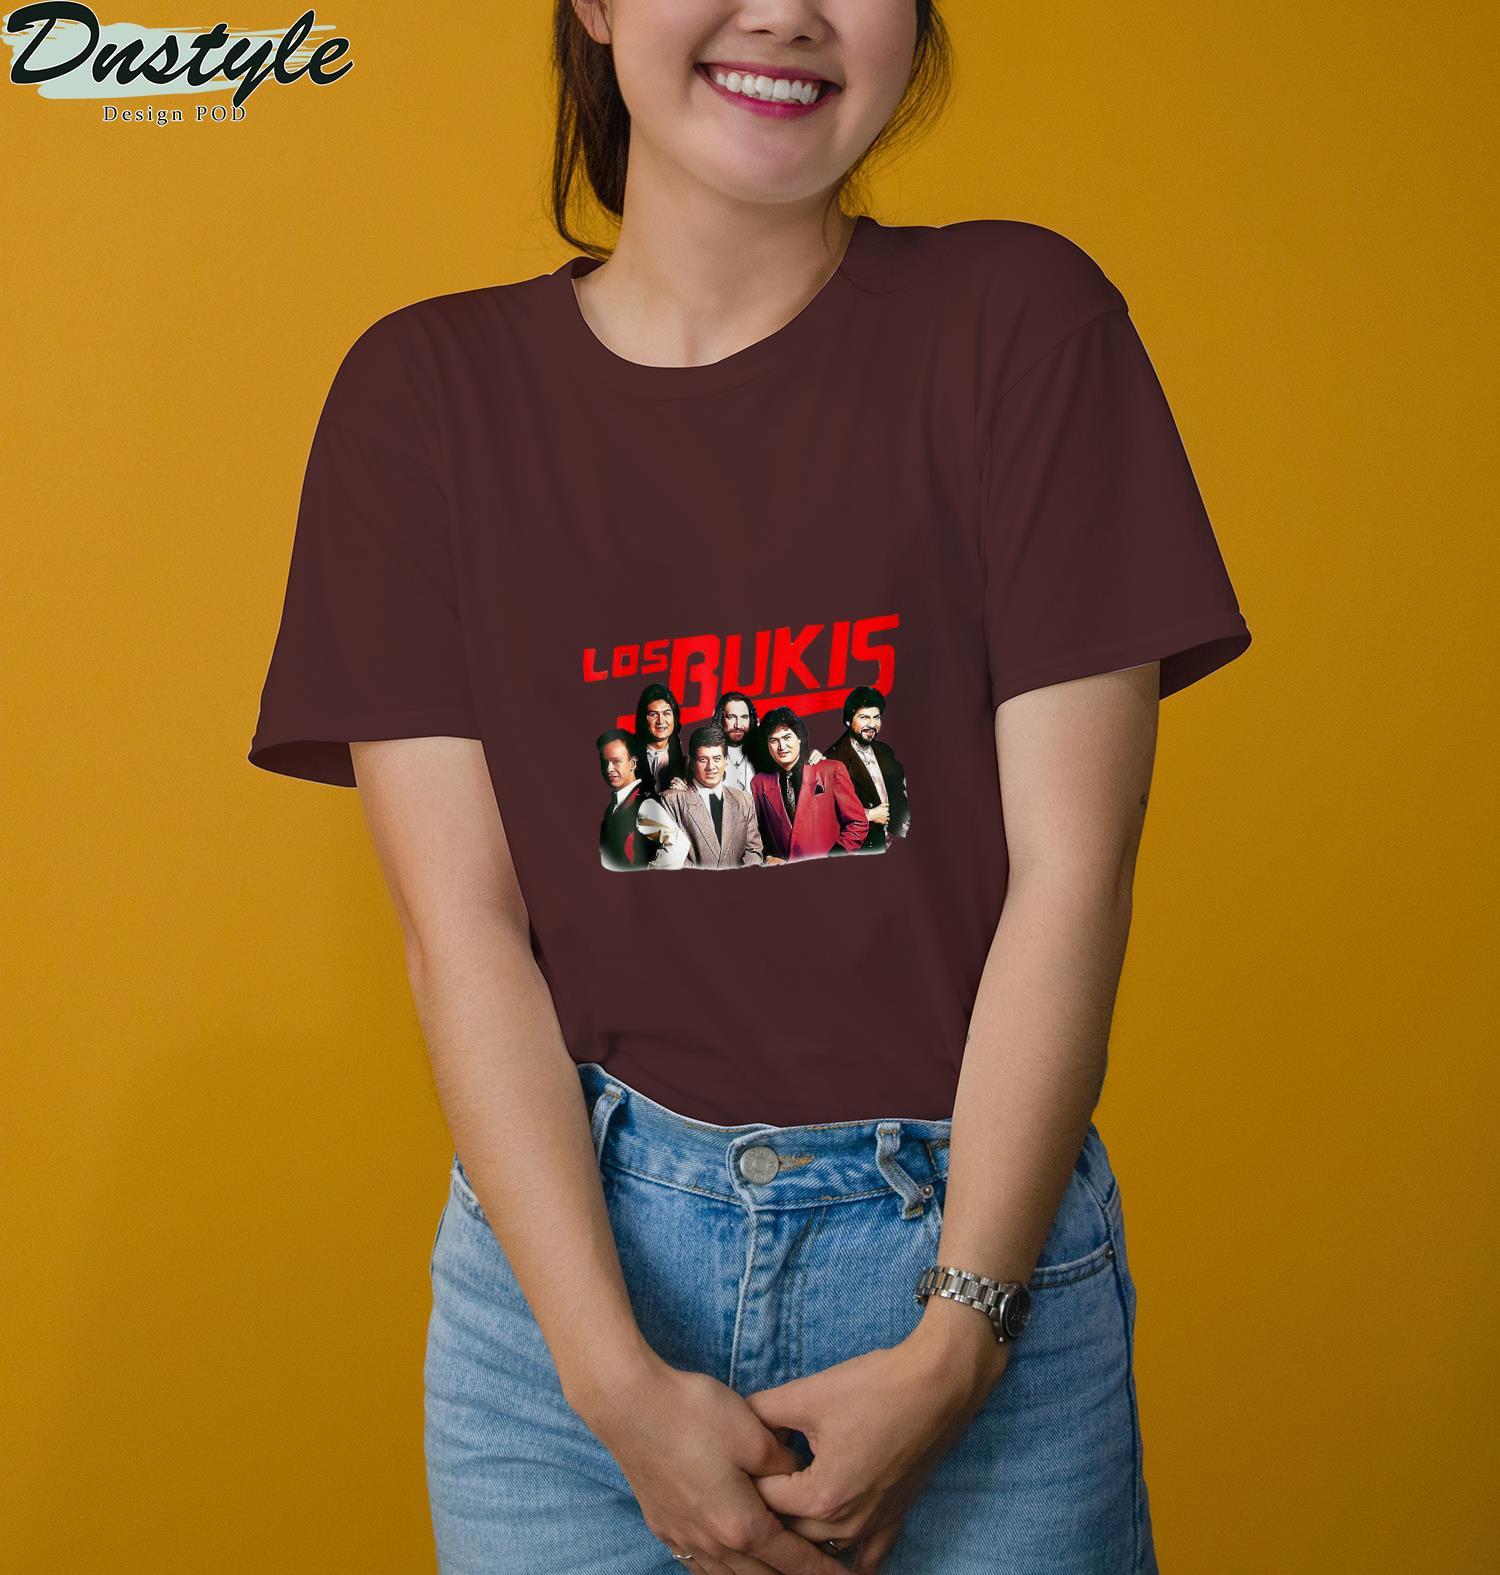 Los bukis t-shirt